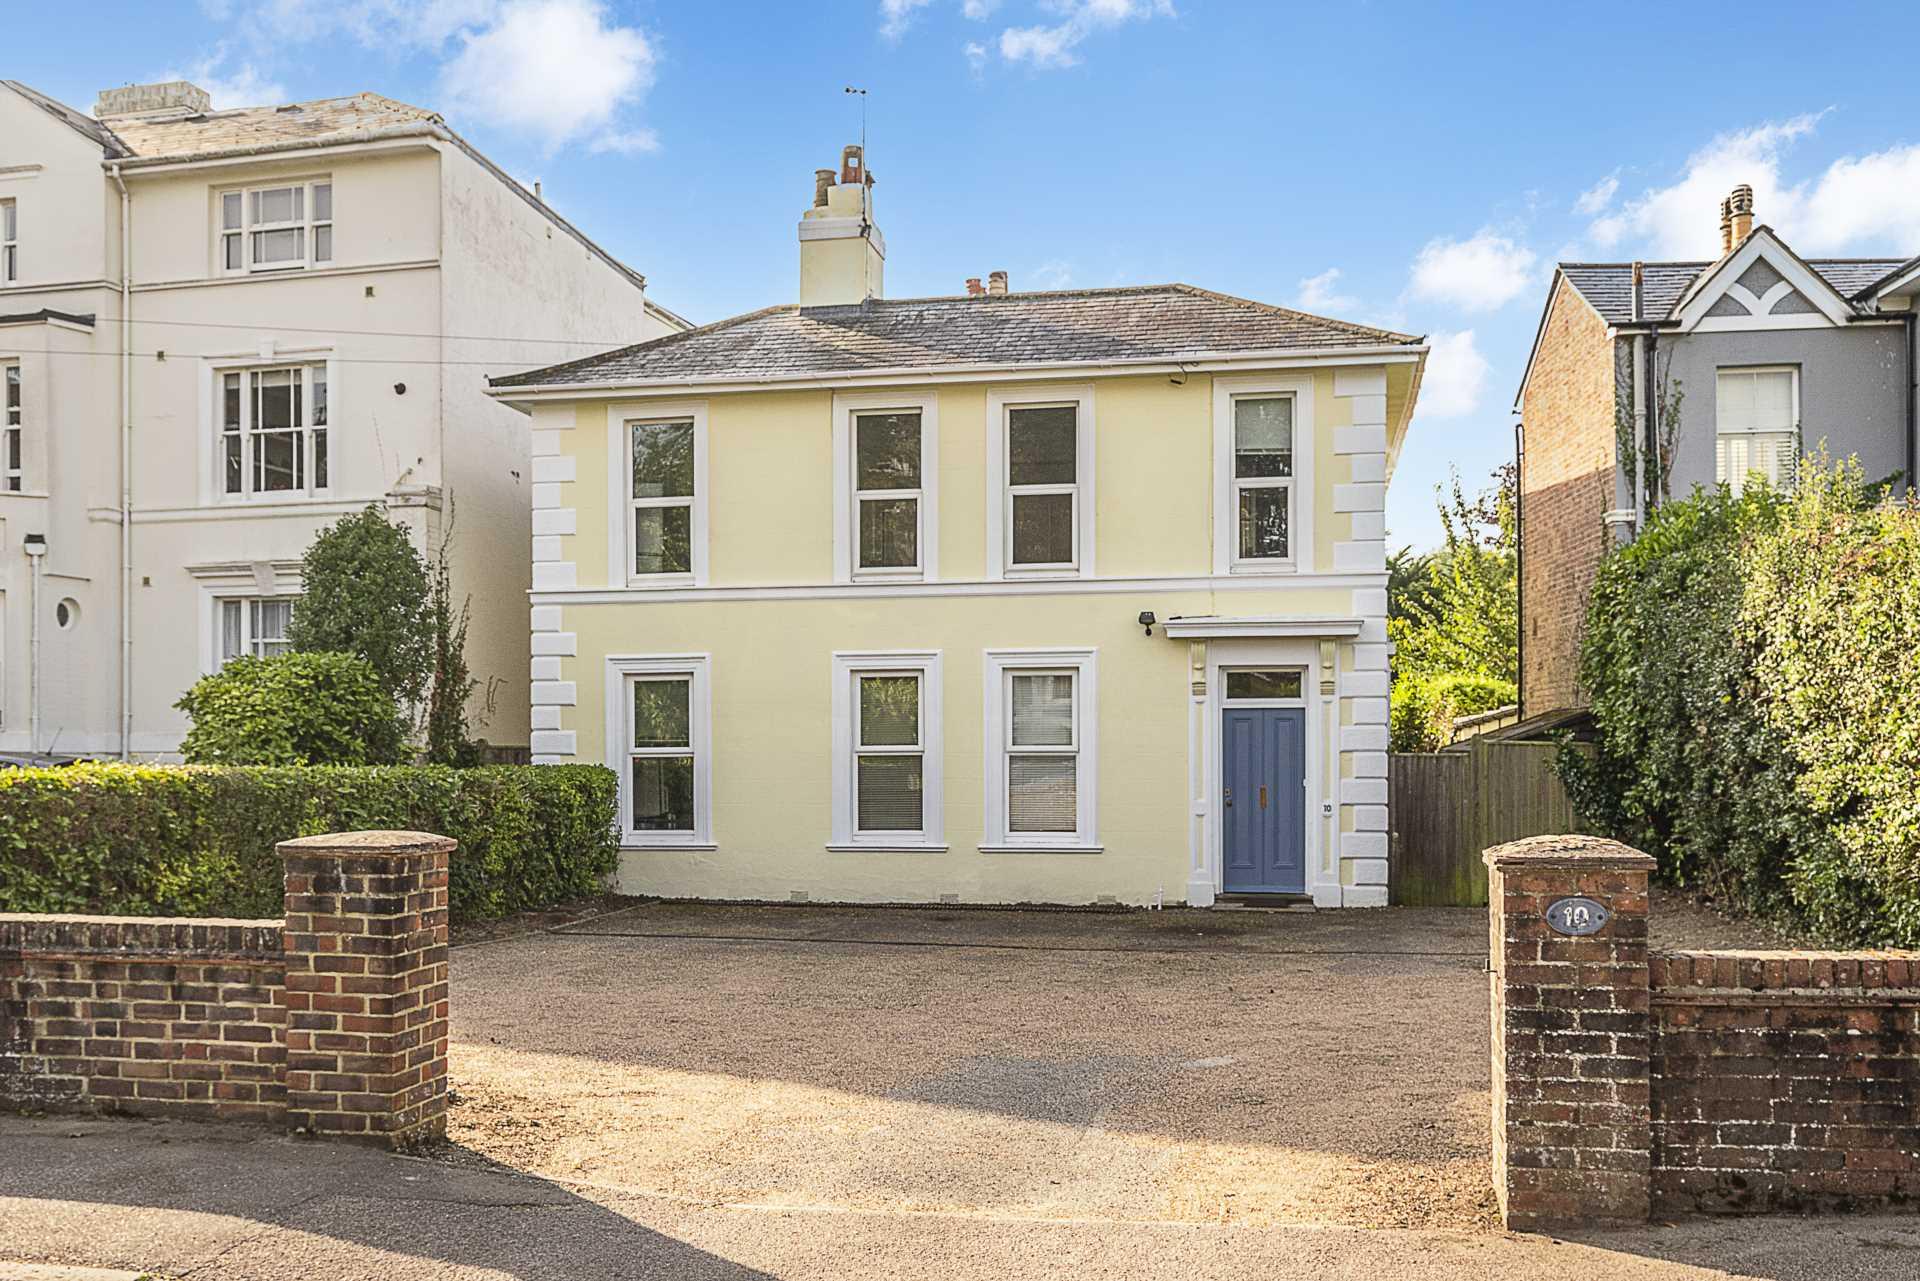 Park Road, Southborough, Tunbridge Wells, Image 16